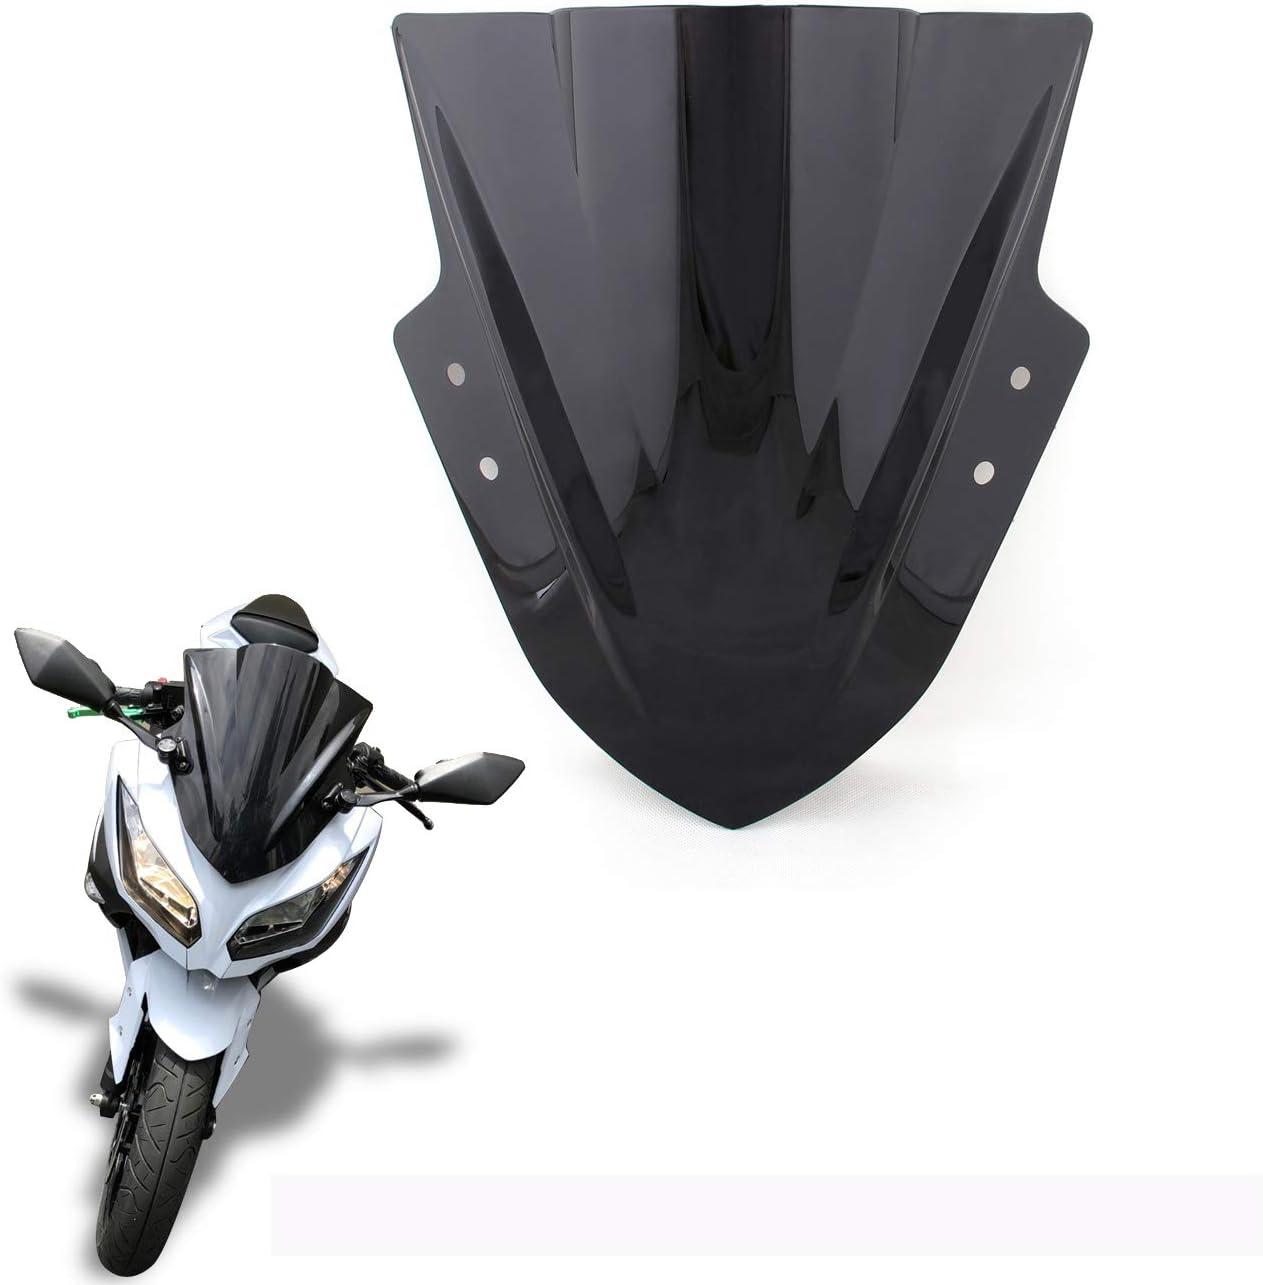 Motocicleta Delantero Parabrisas con Soportes Deflector de Viento Windshield para KAWASA-KI Ninja 1000 Z1000SX 2017-2019 Artudatech Moto Parabrisas